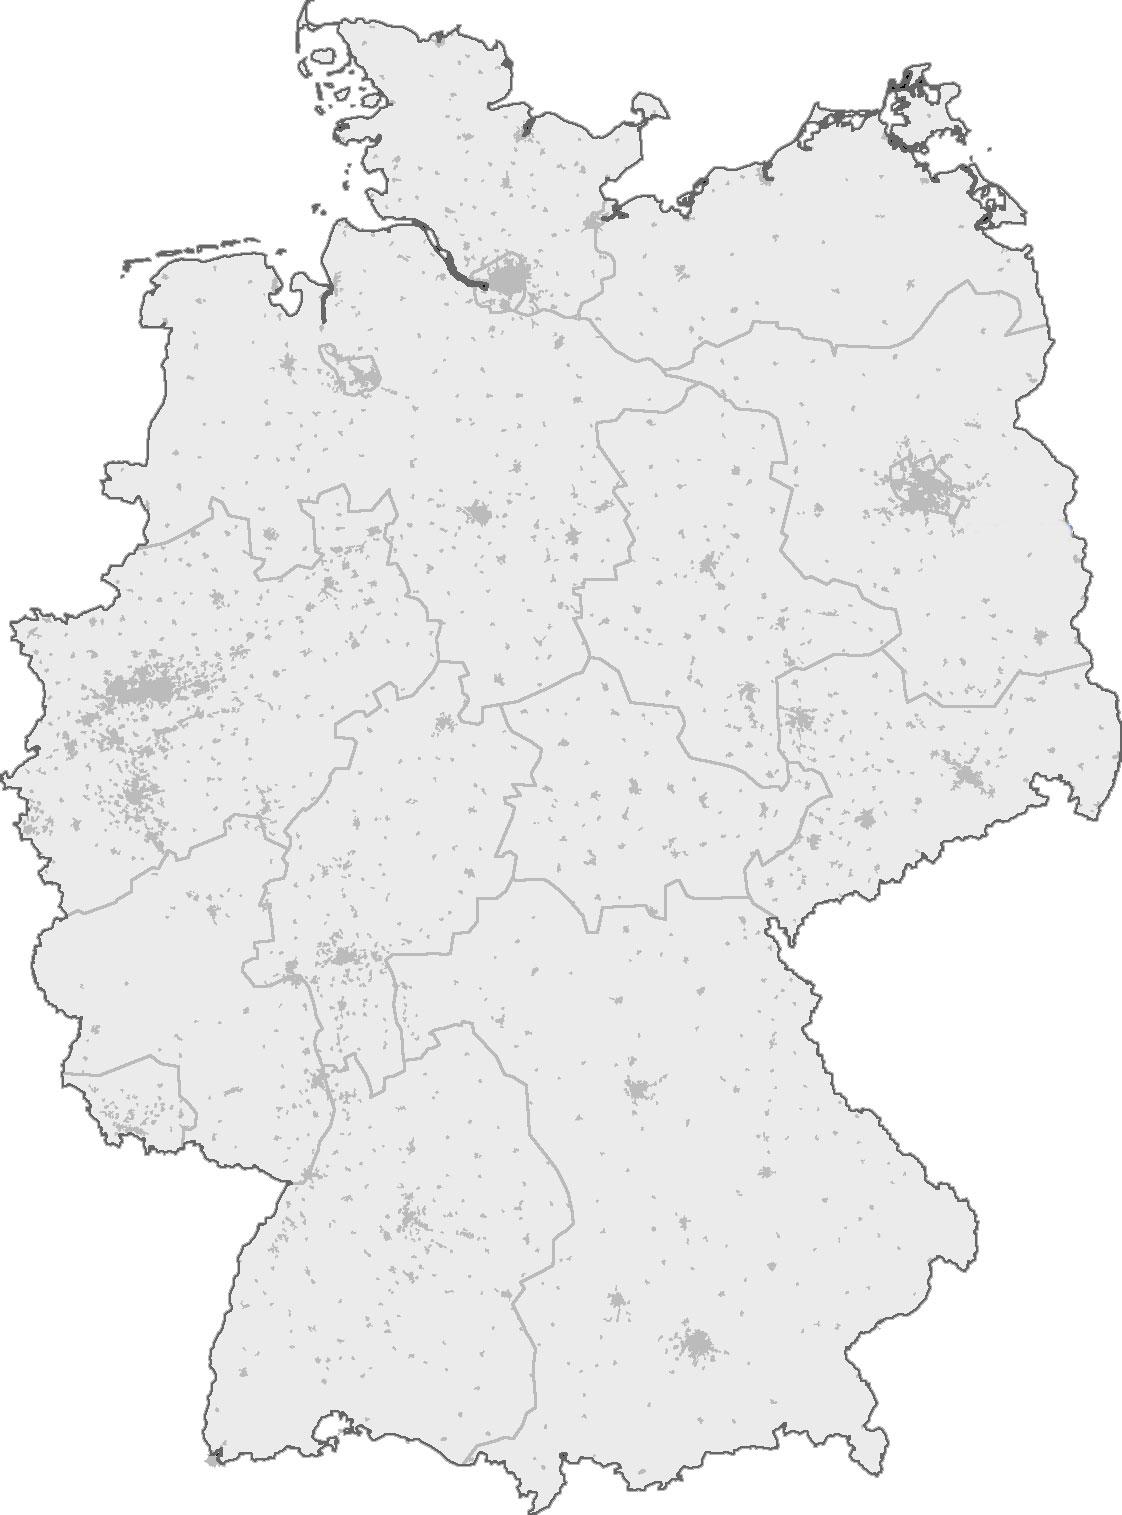 Karte-Deutschland-gross.jpg